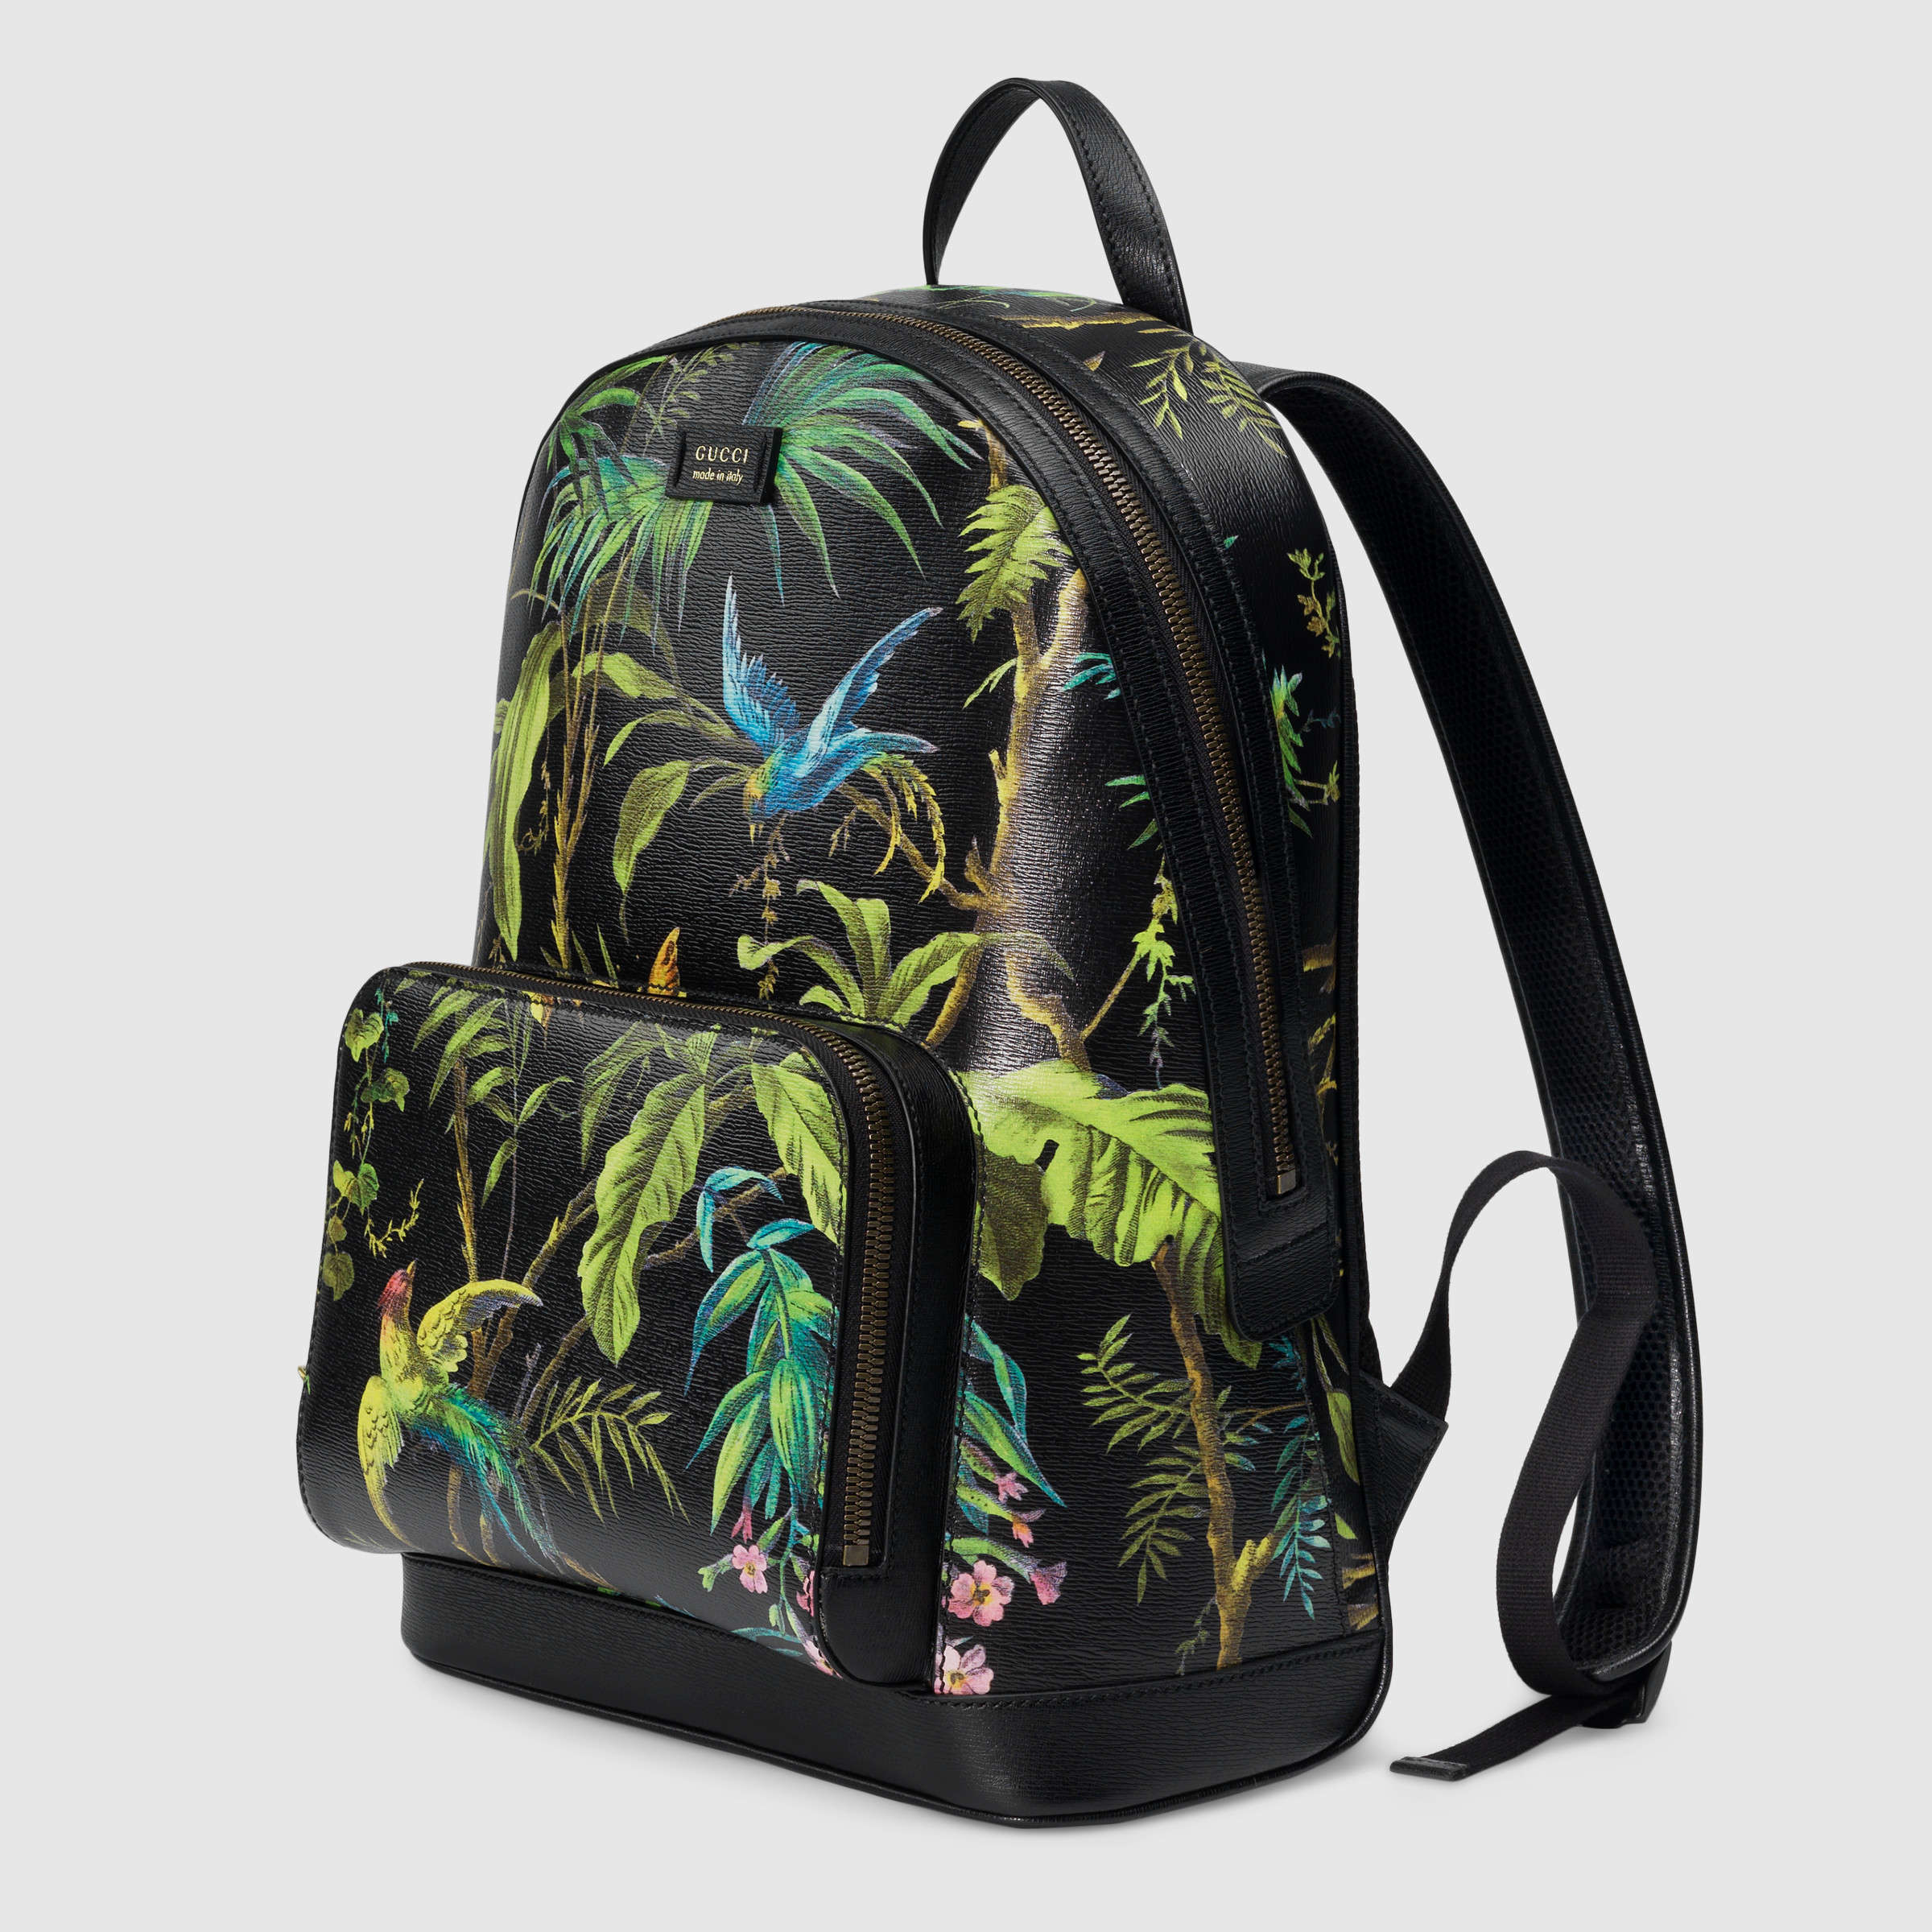 Lyst - Gucci Tropical Print Leather Backpack in Brown a917cb30588da